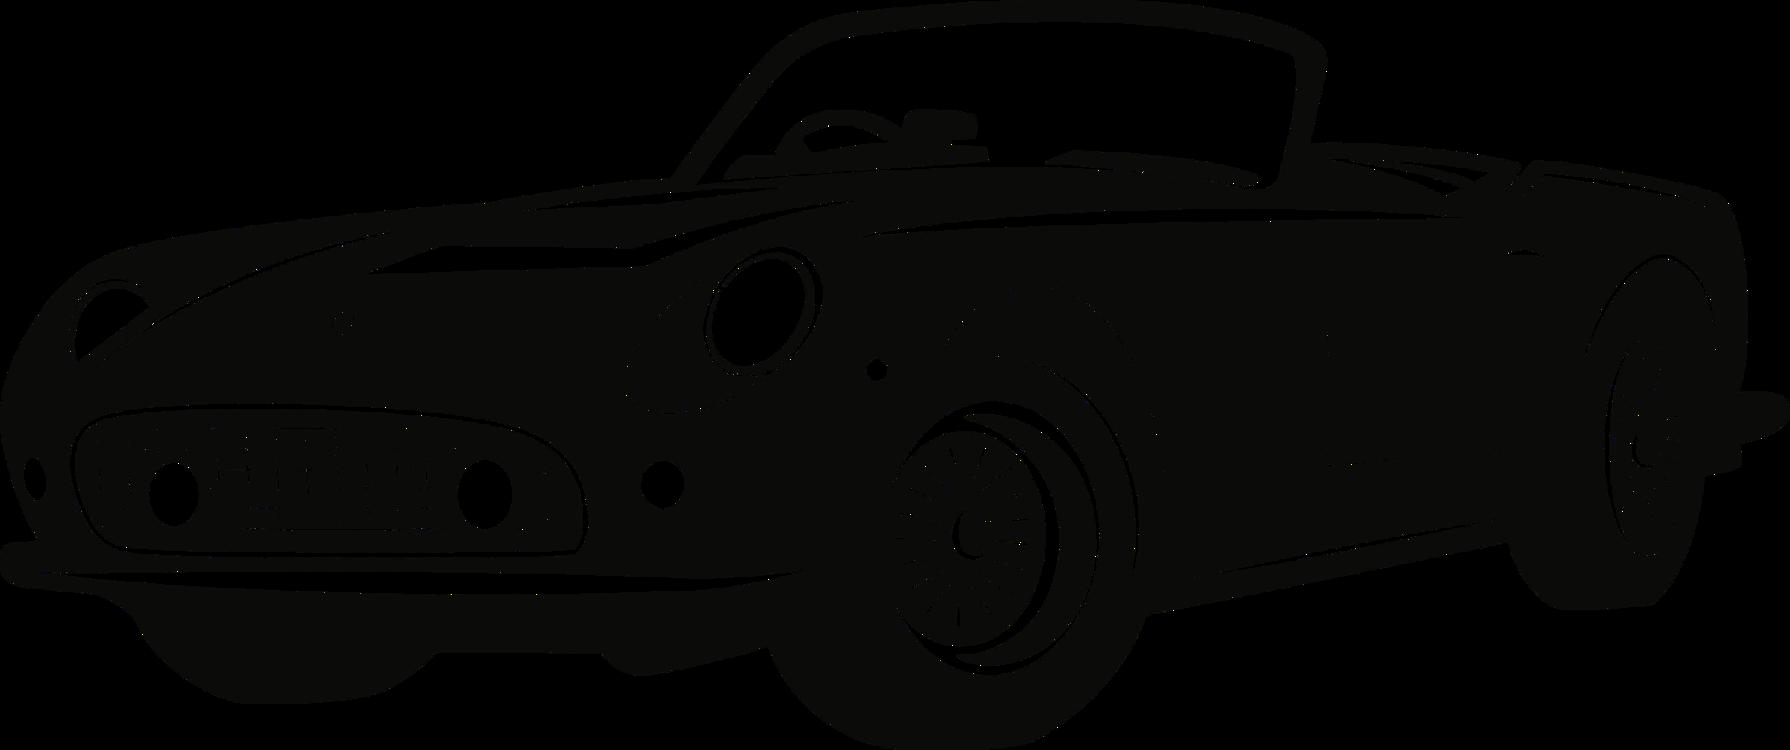 Sports Car Classic Car Porsche 356 2017 Lamborghini Transparent Background Car Clip Art Transparent Cartoon Jing Fm